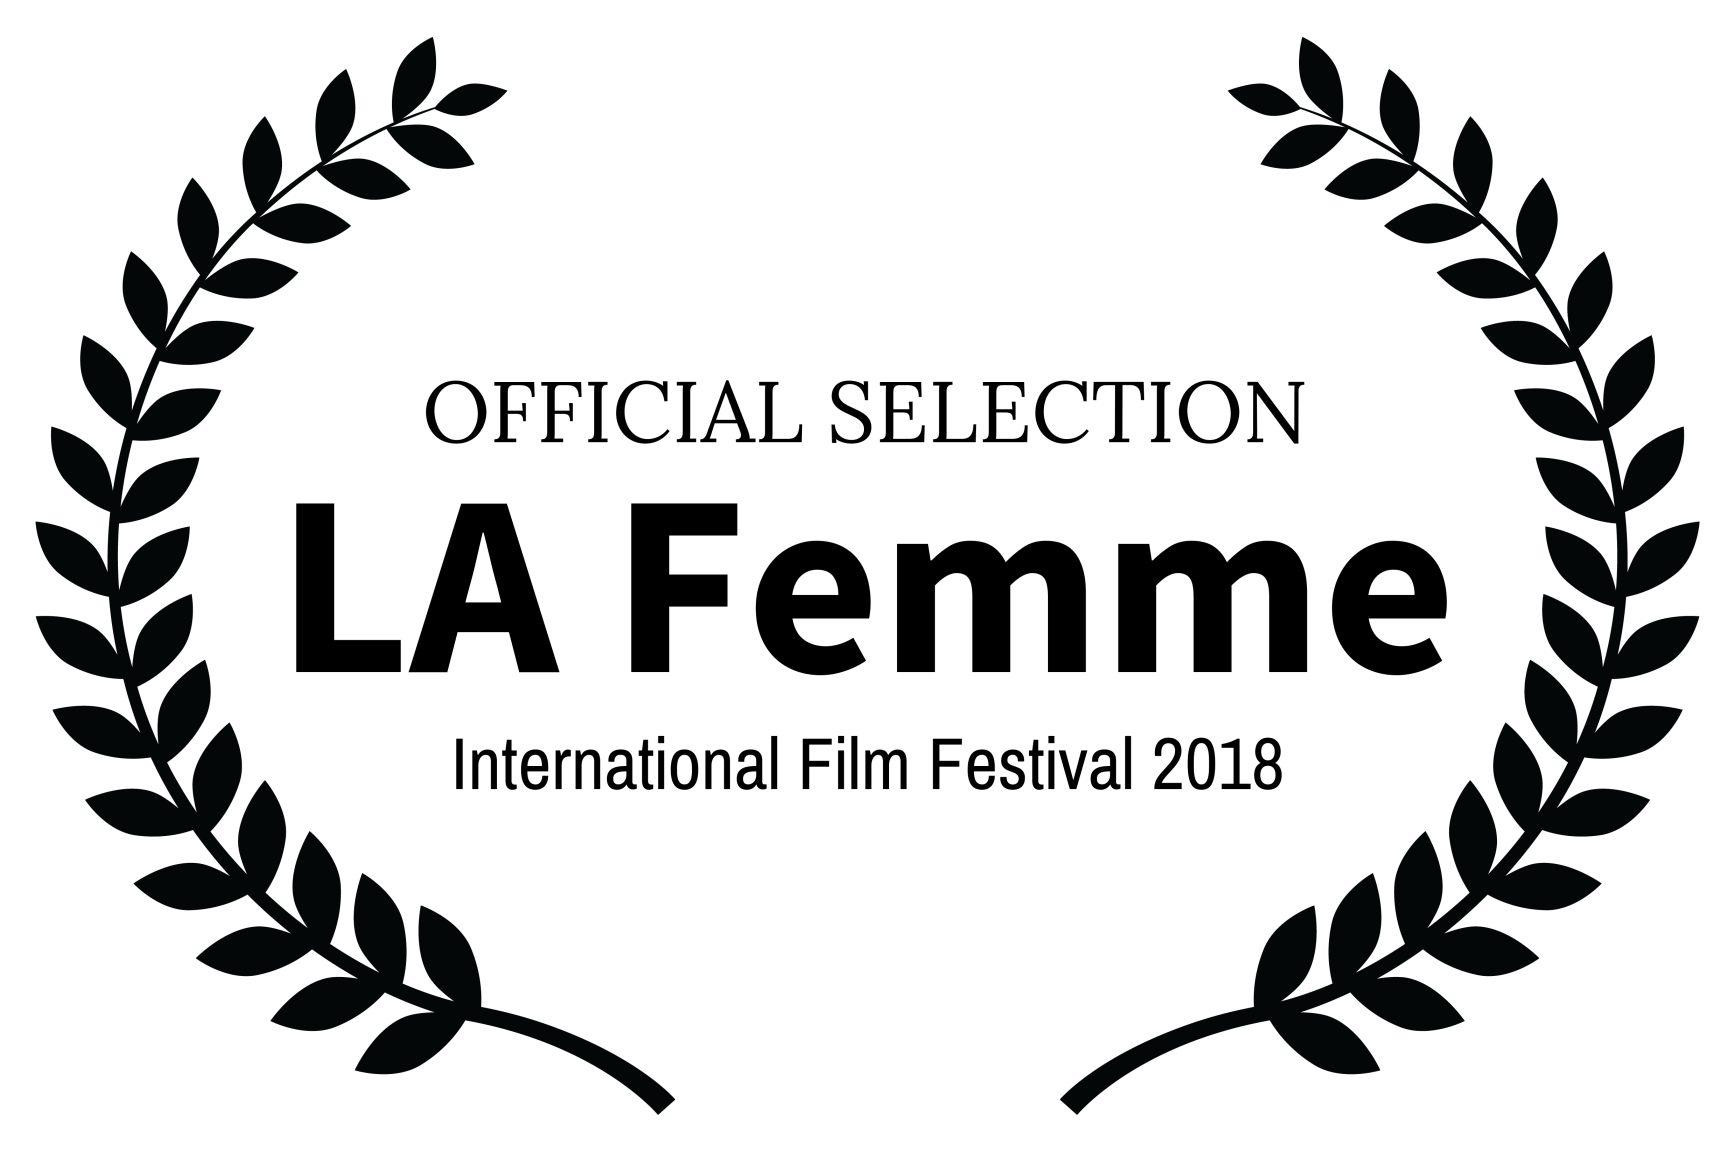 OFFICIAL SELECTION - LA Femme - International Film Festival 2018 (1).png